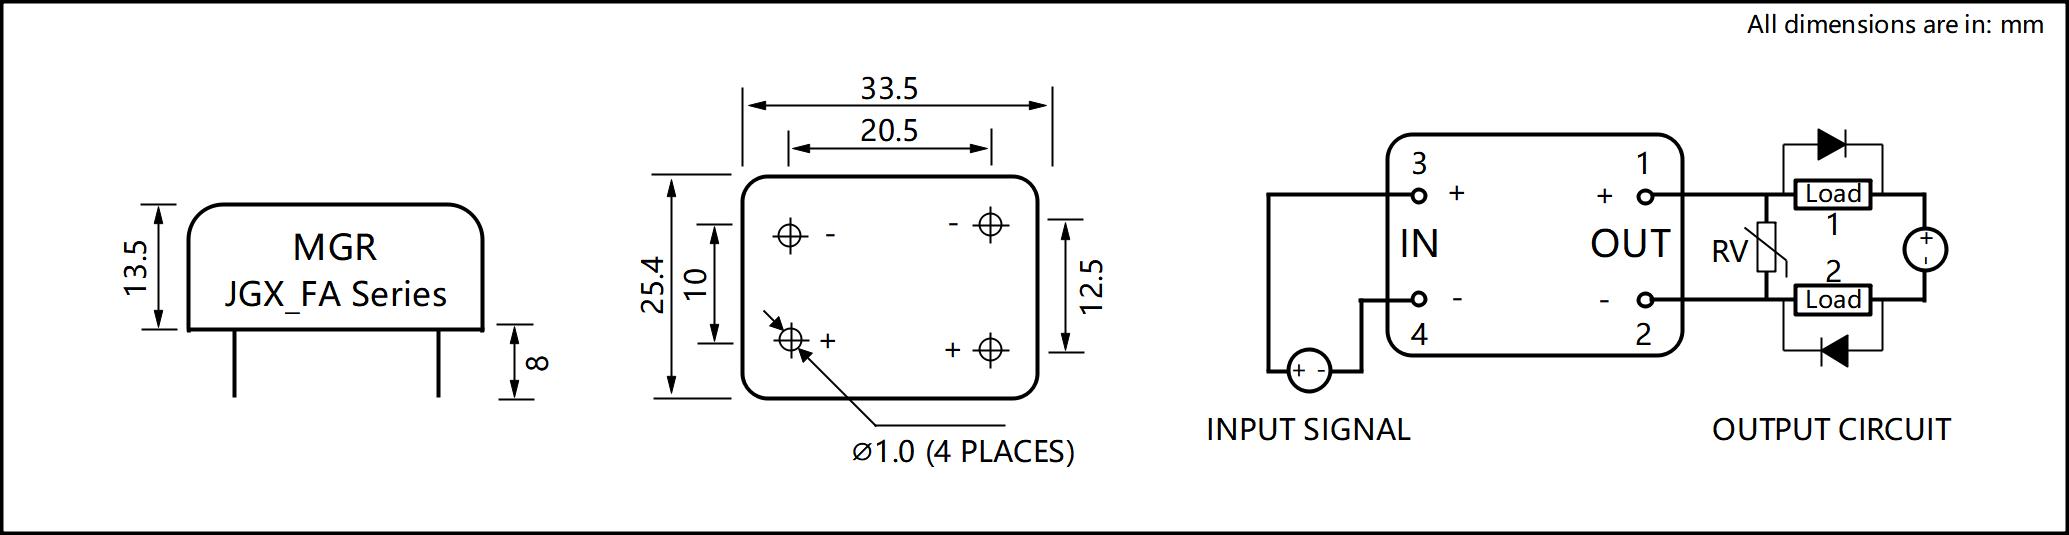 JGX_FA Series Metal Housing PCB Mount Solid State Relay Circuit Wring Diagram